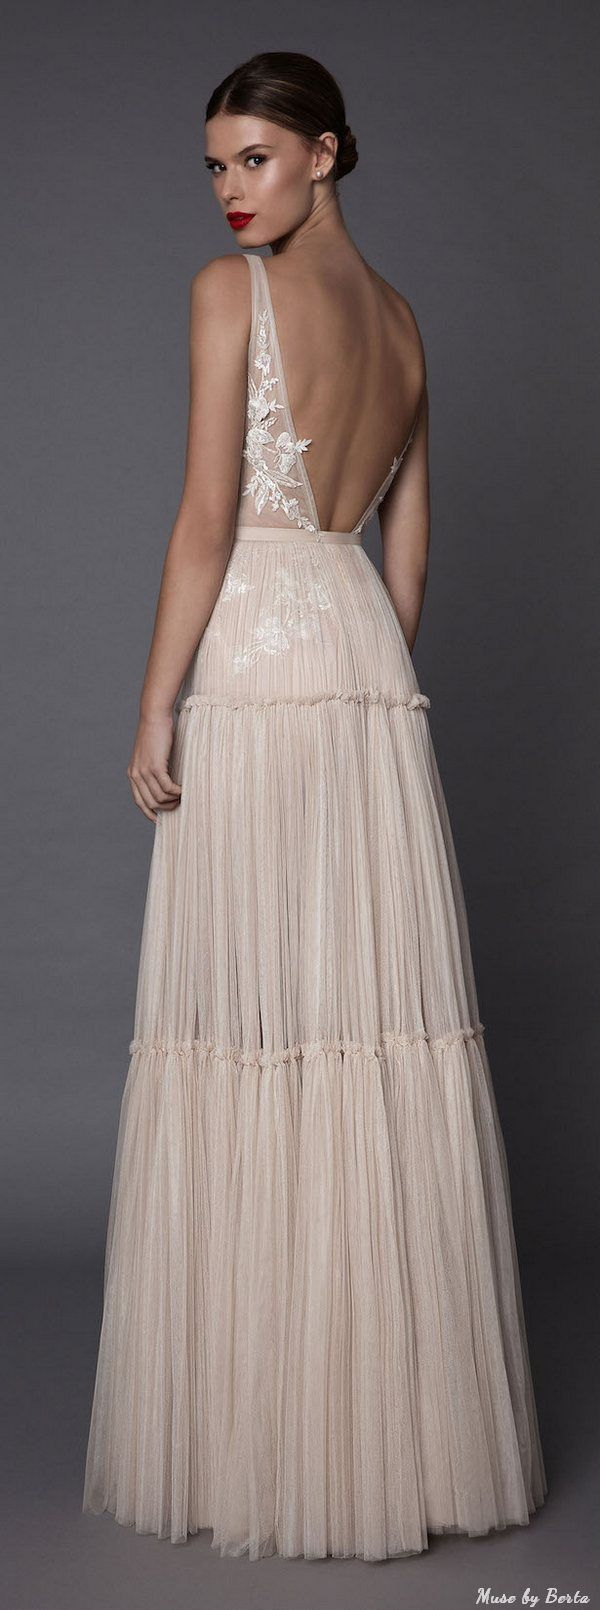 Muse by Berta Wedding Dress ANNABEL 3 | Traumhochzeit ...